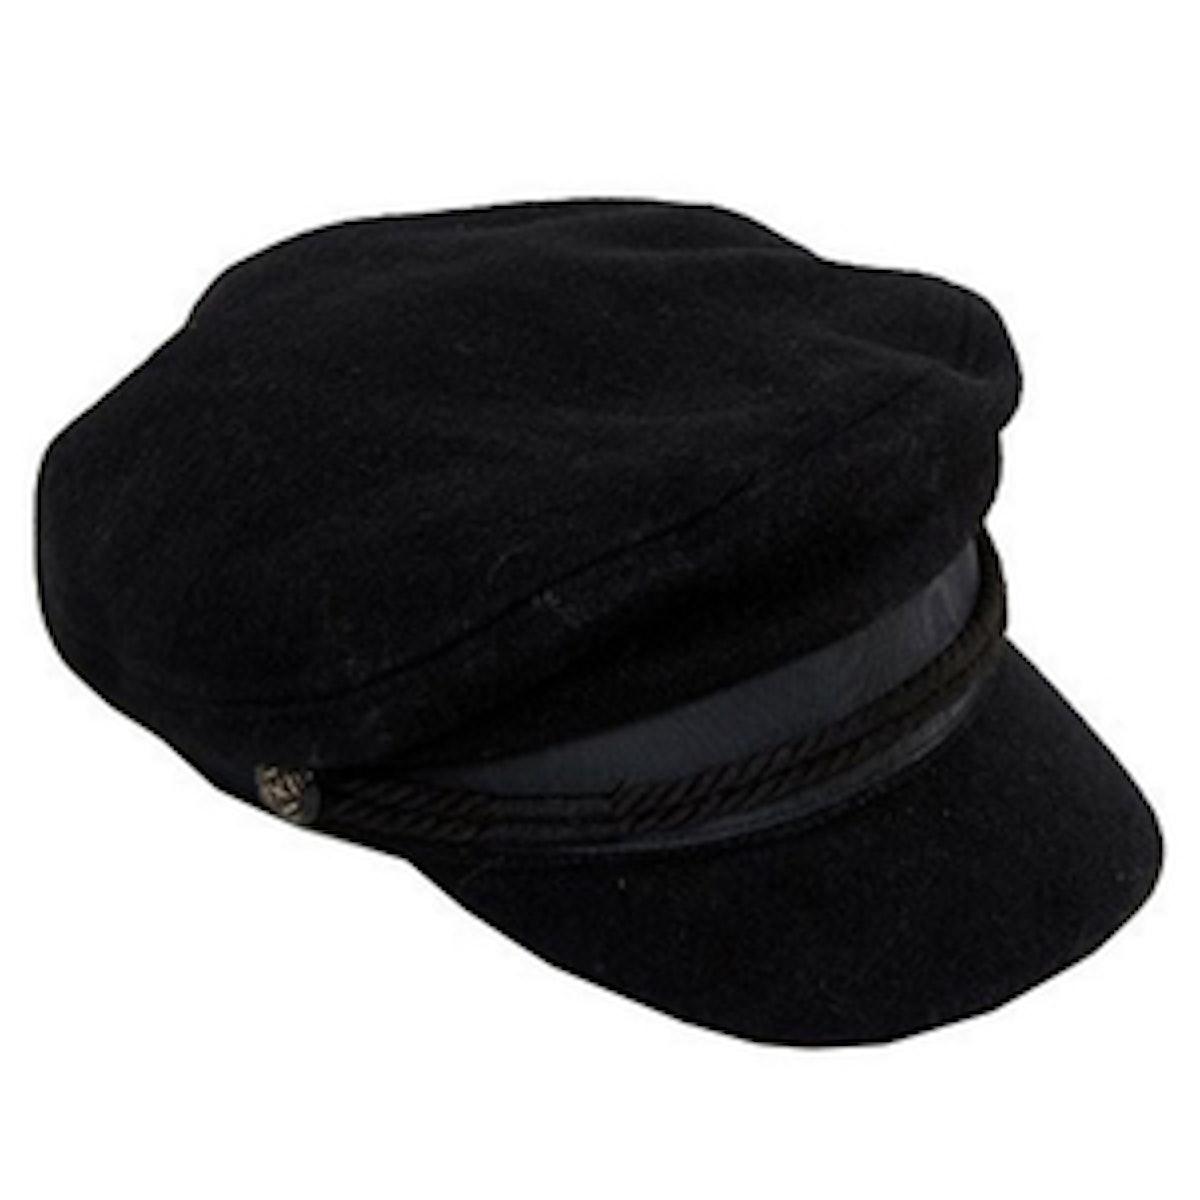 High Crown Wool Baker Boy Hat